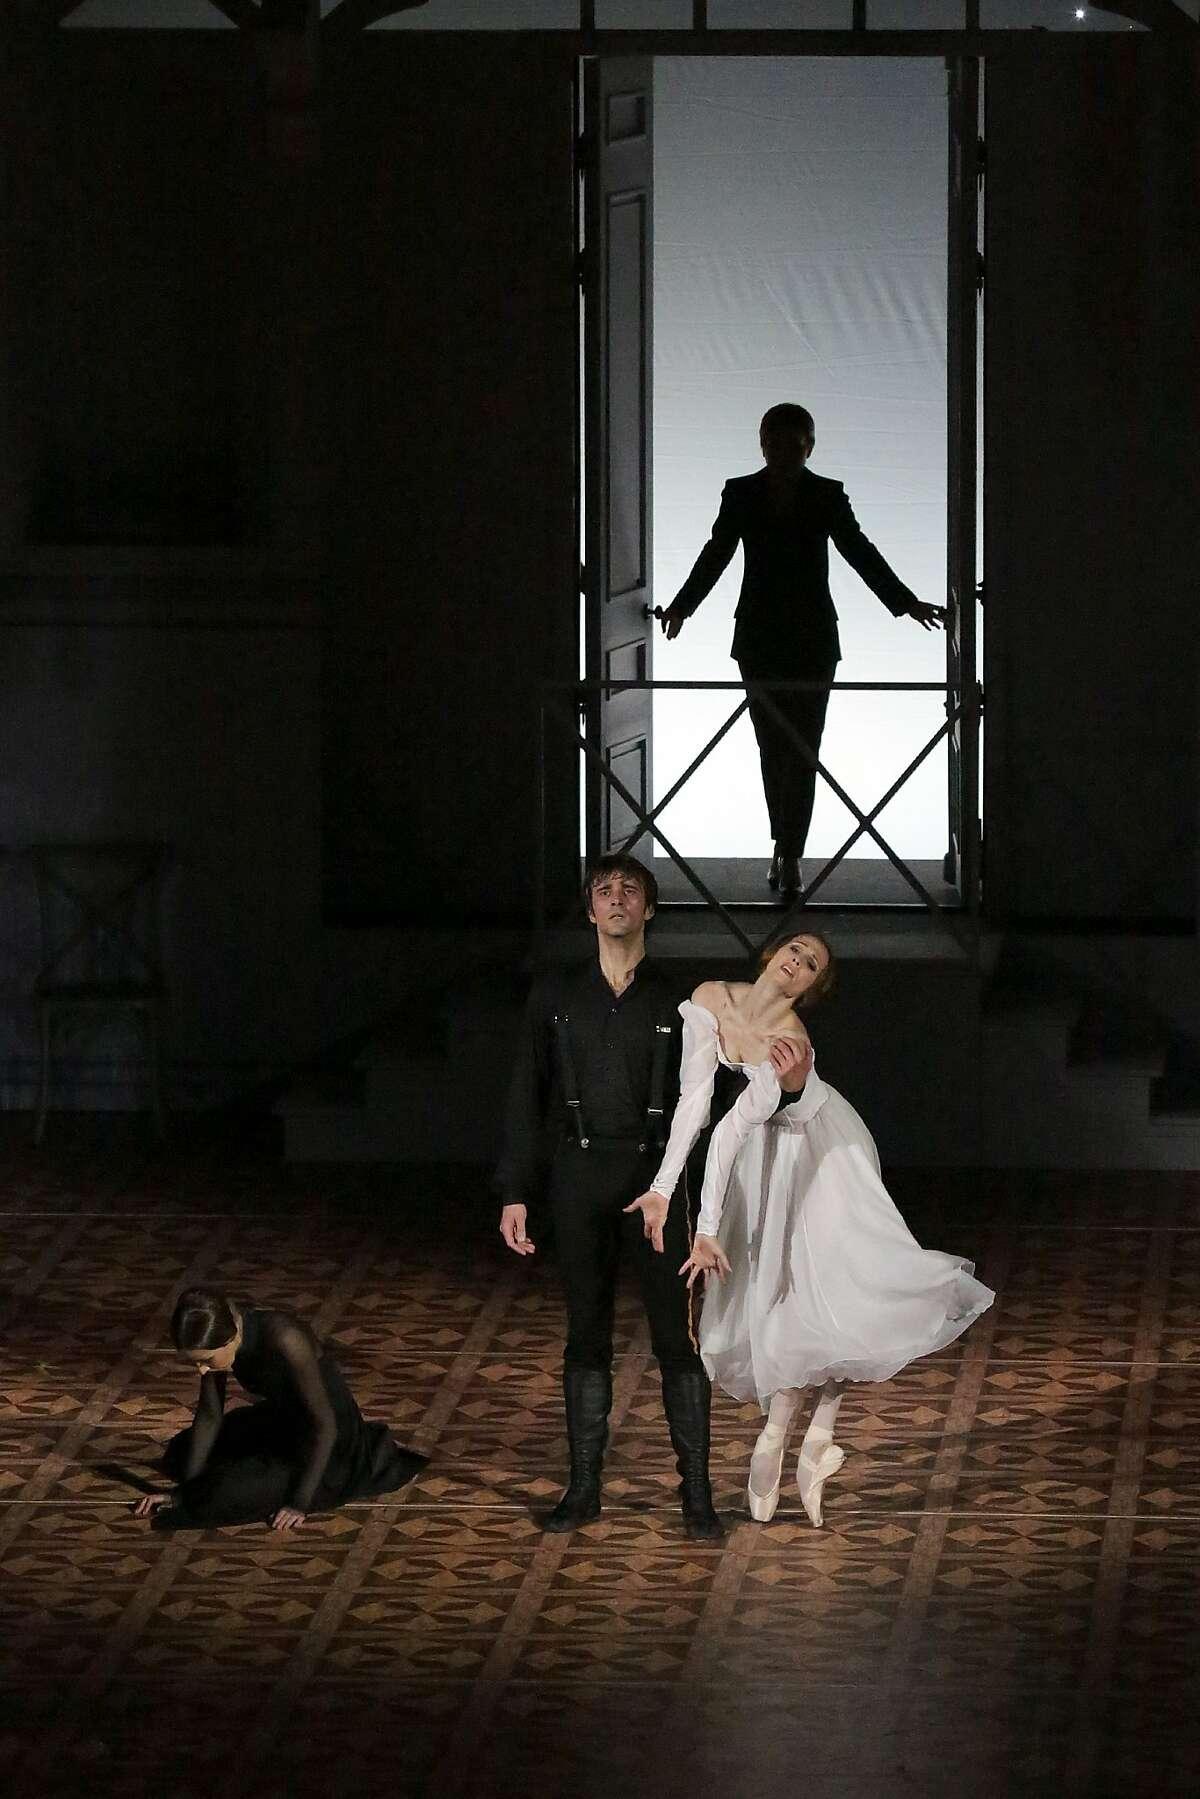 For �A Hero of Our Time.� Dancers: Svetlana Zakharova, Ruslan Skvortsov and Krisitina Kretova. Credit: Damir Yusupov